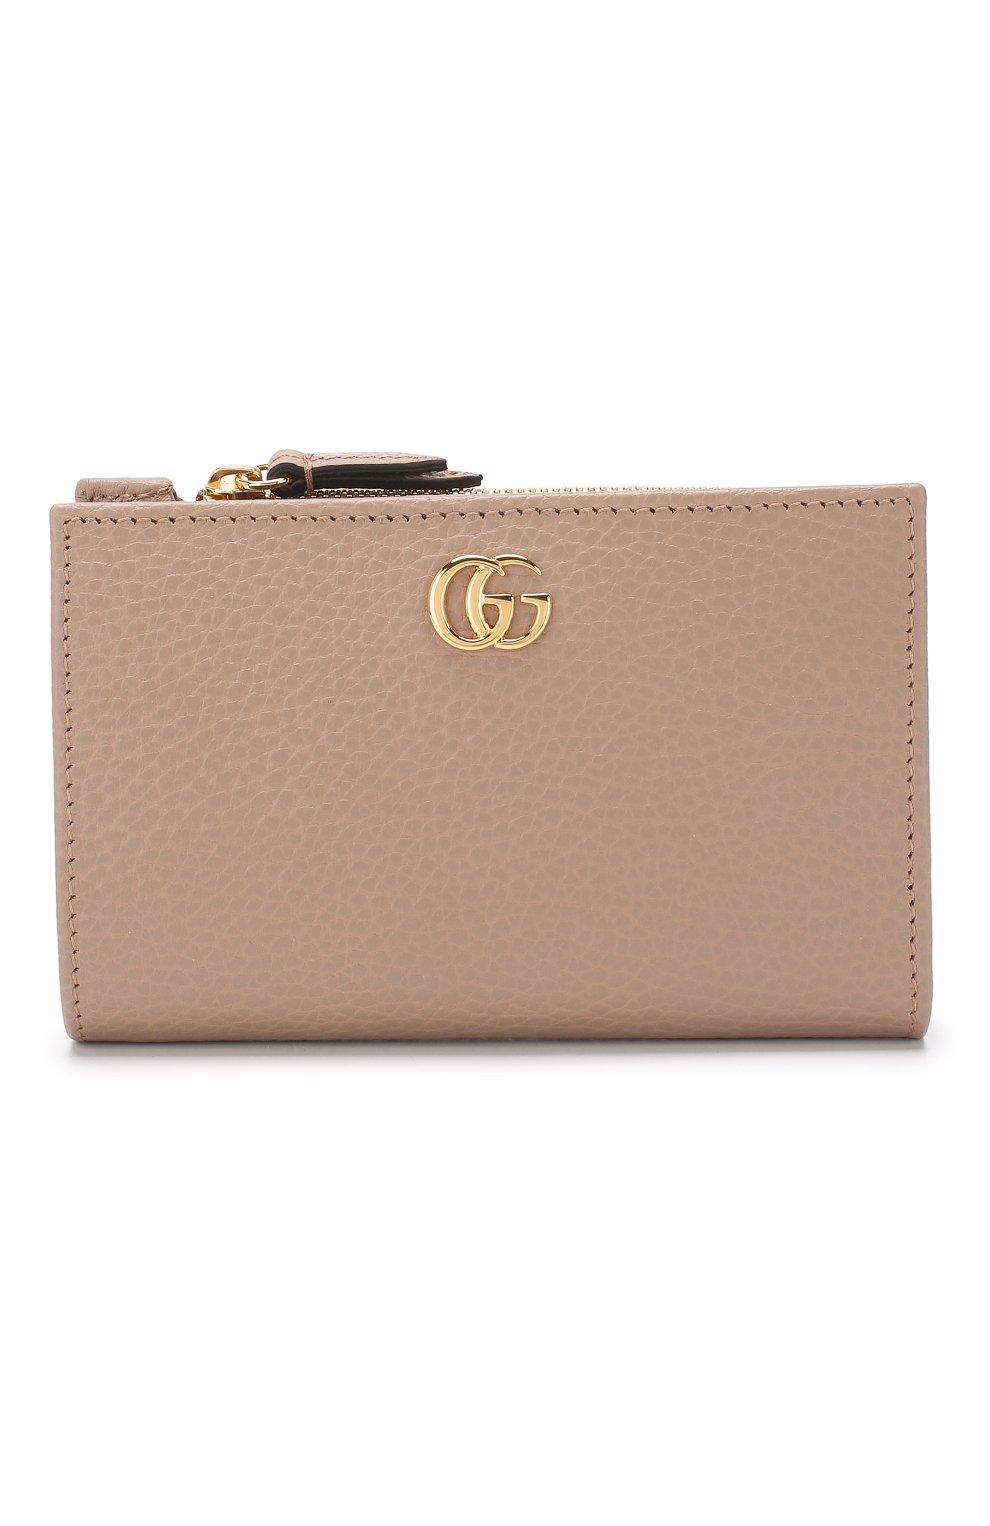 Кожаное портмоне GG Marmon Gucci бежевого цвета | Фото №1